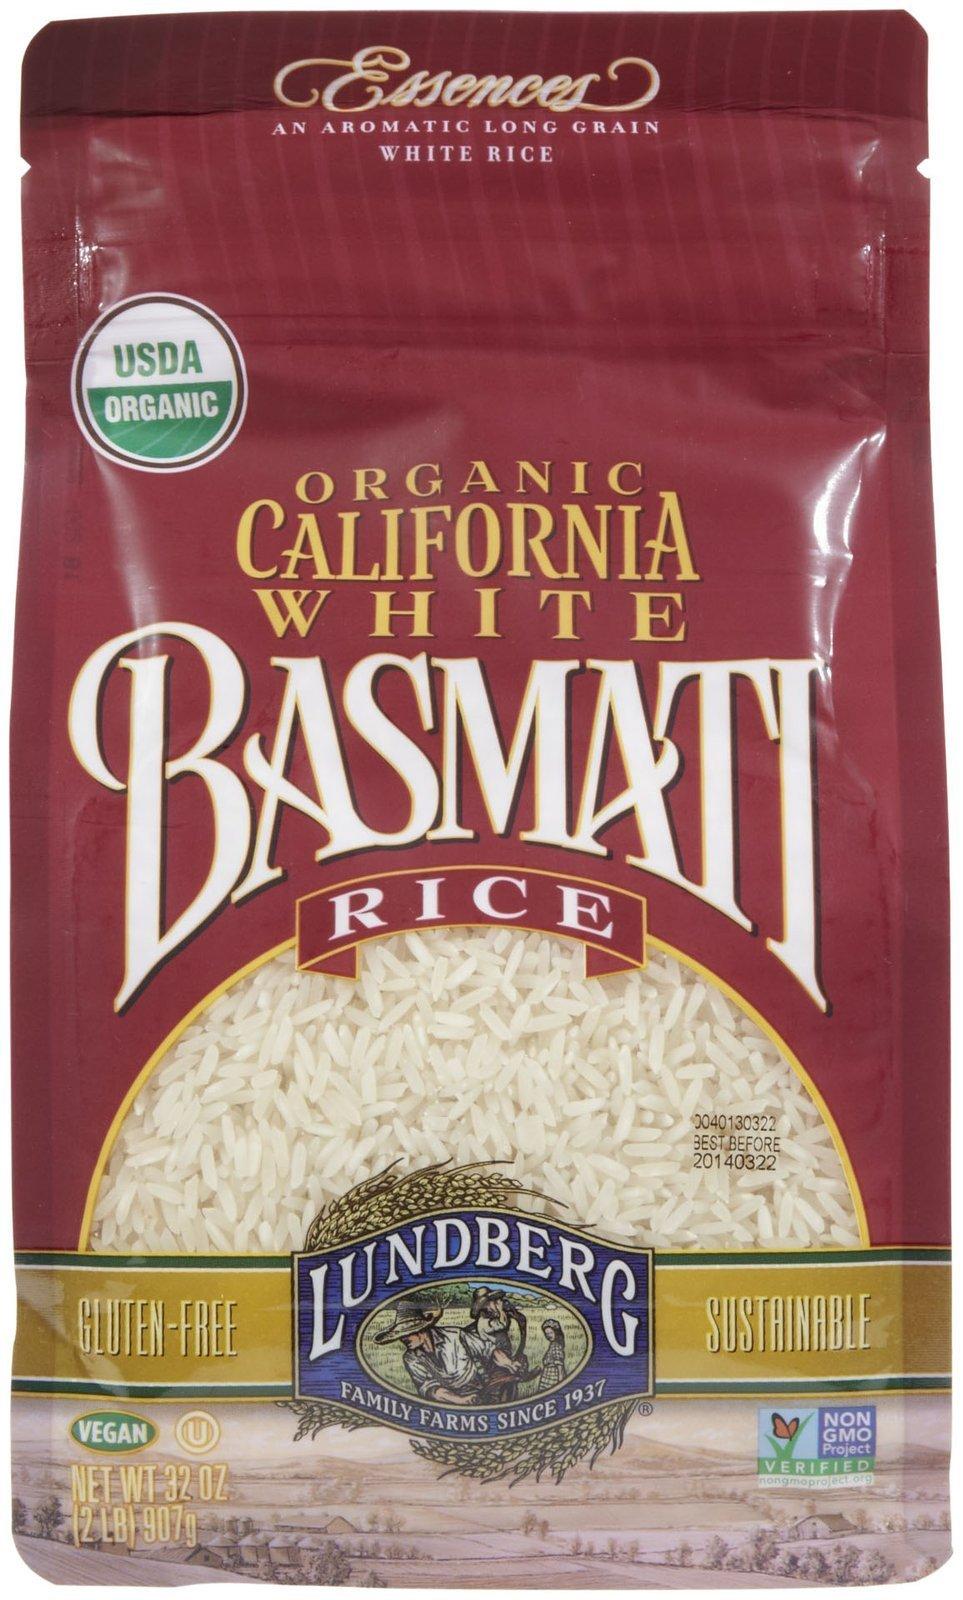 Lundberg Organic Rice - White Basmati - 32 oz